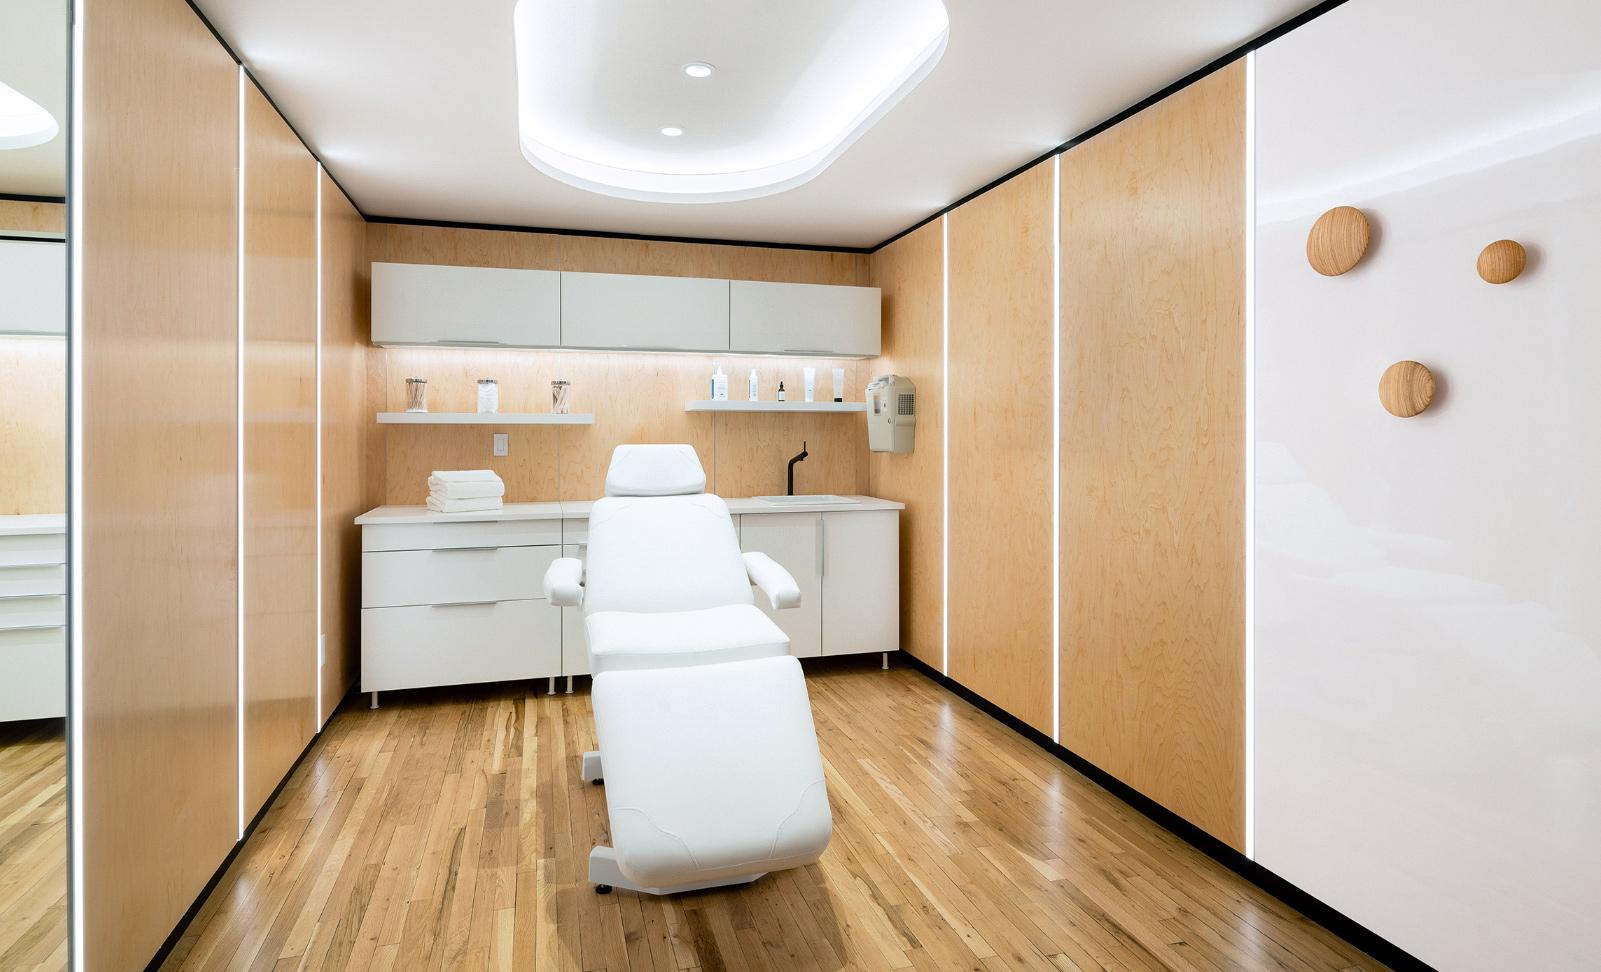 interiors_1_lrg.jpg